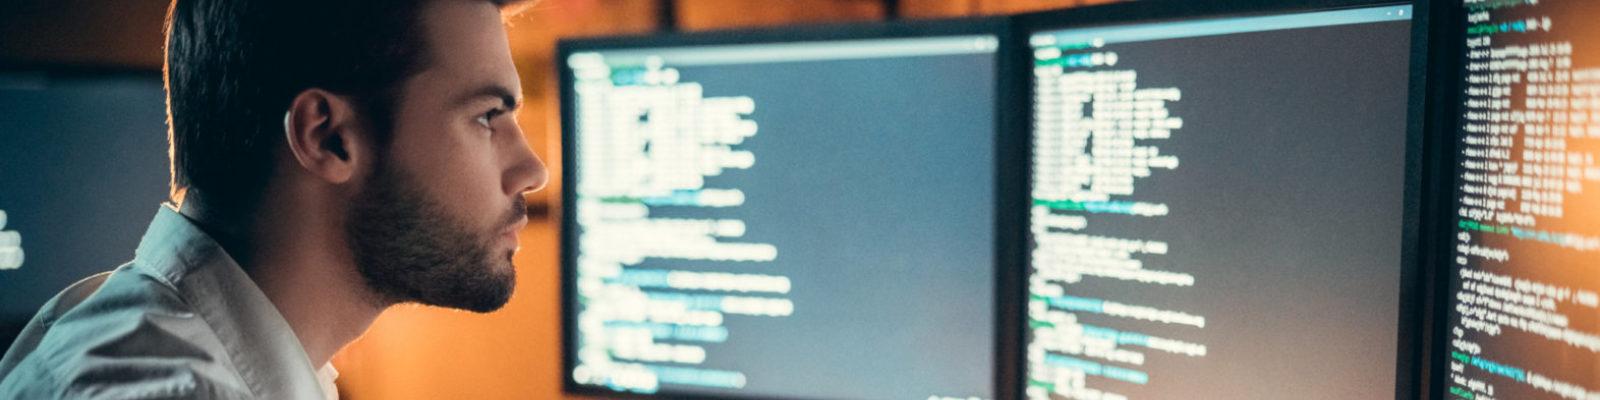 man Working on code